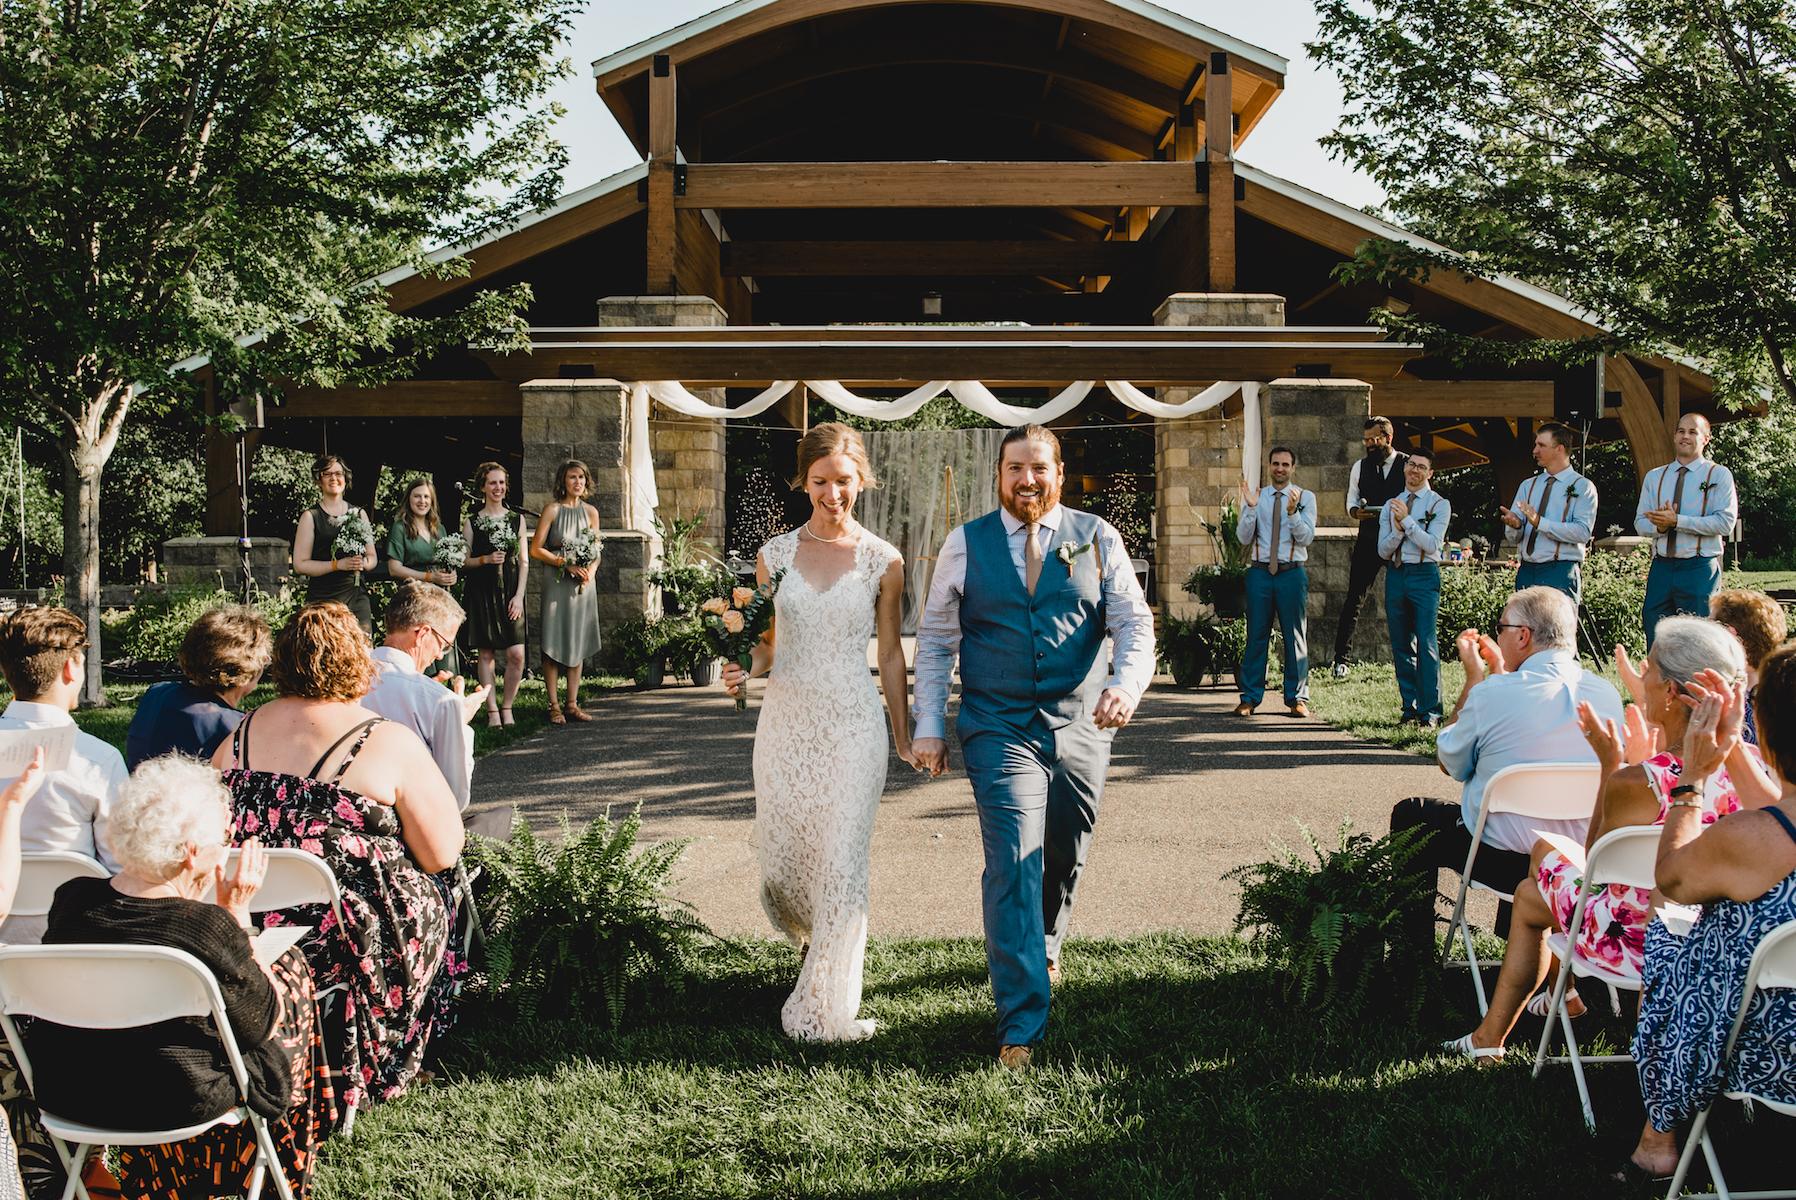 engle-olson-emily-skyler-mn-wedding-43.jpg